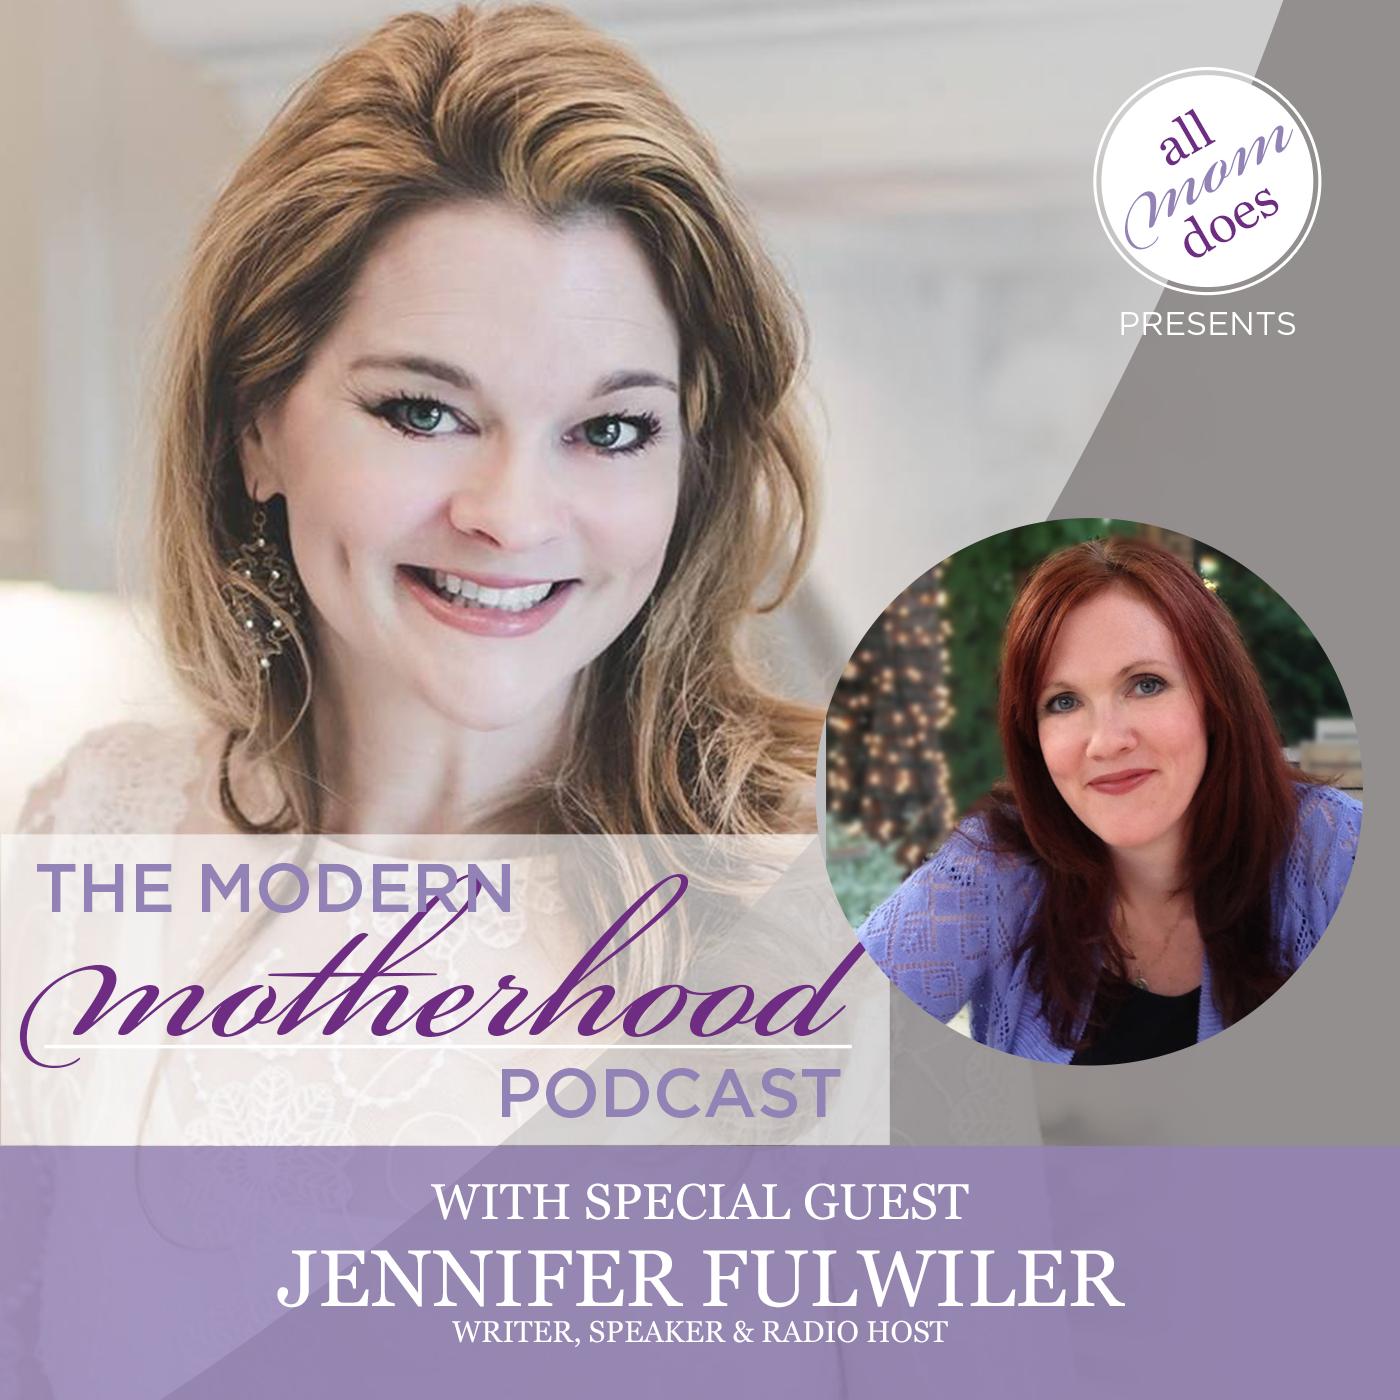 The Modern Motherhood Podcast #16: Jen Fulwiler